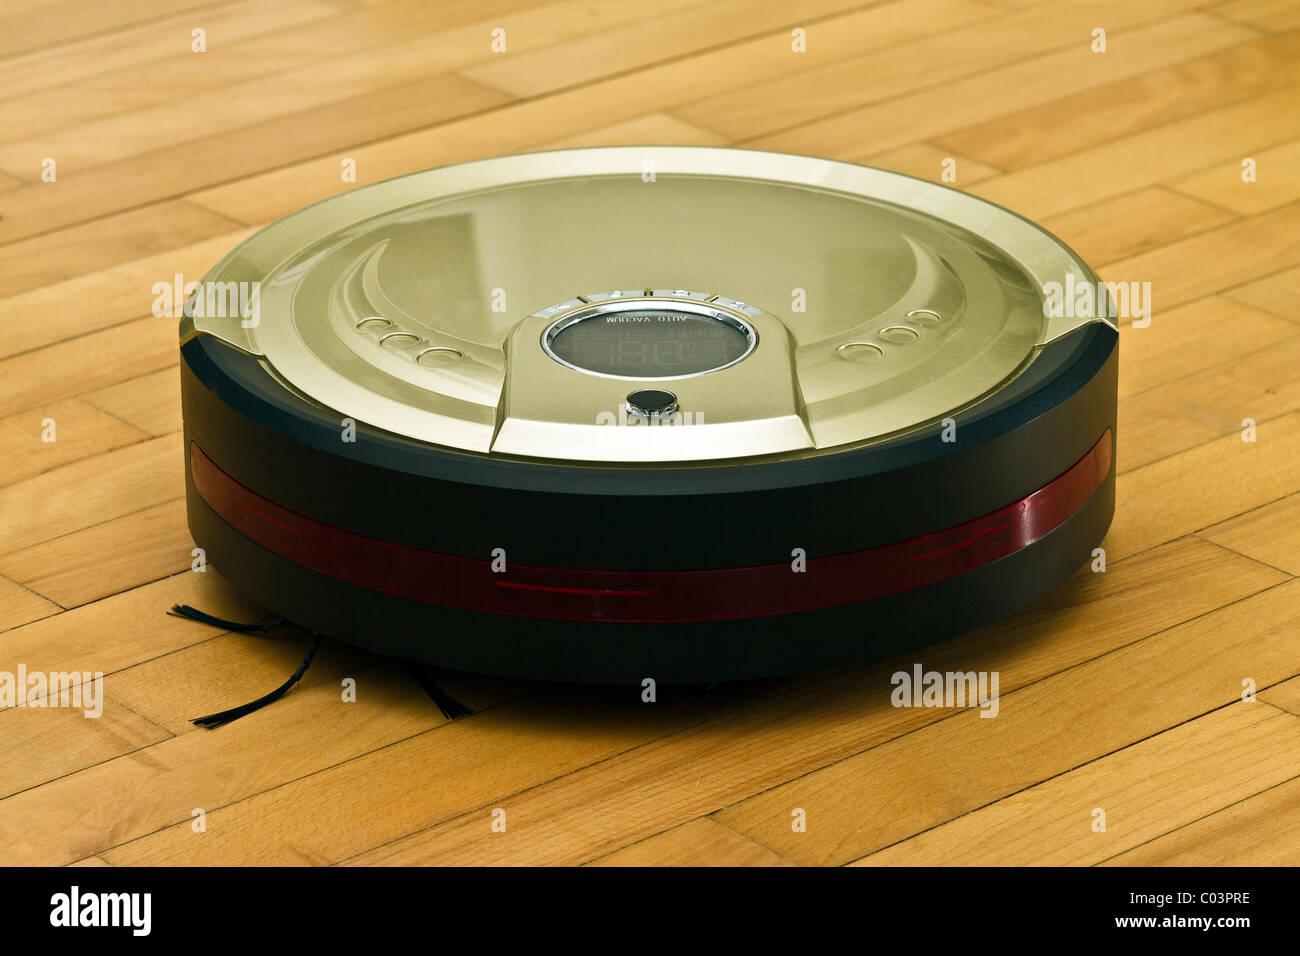 A robotic vacuum cleaner on parquet - Stock Image